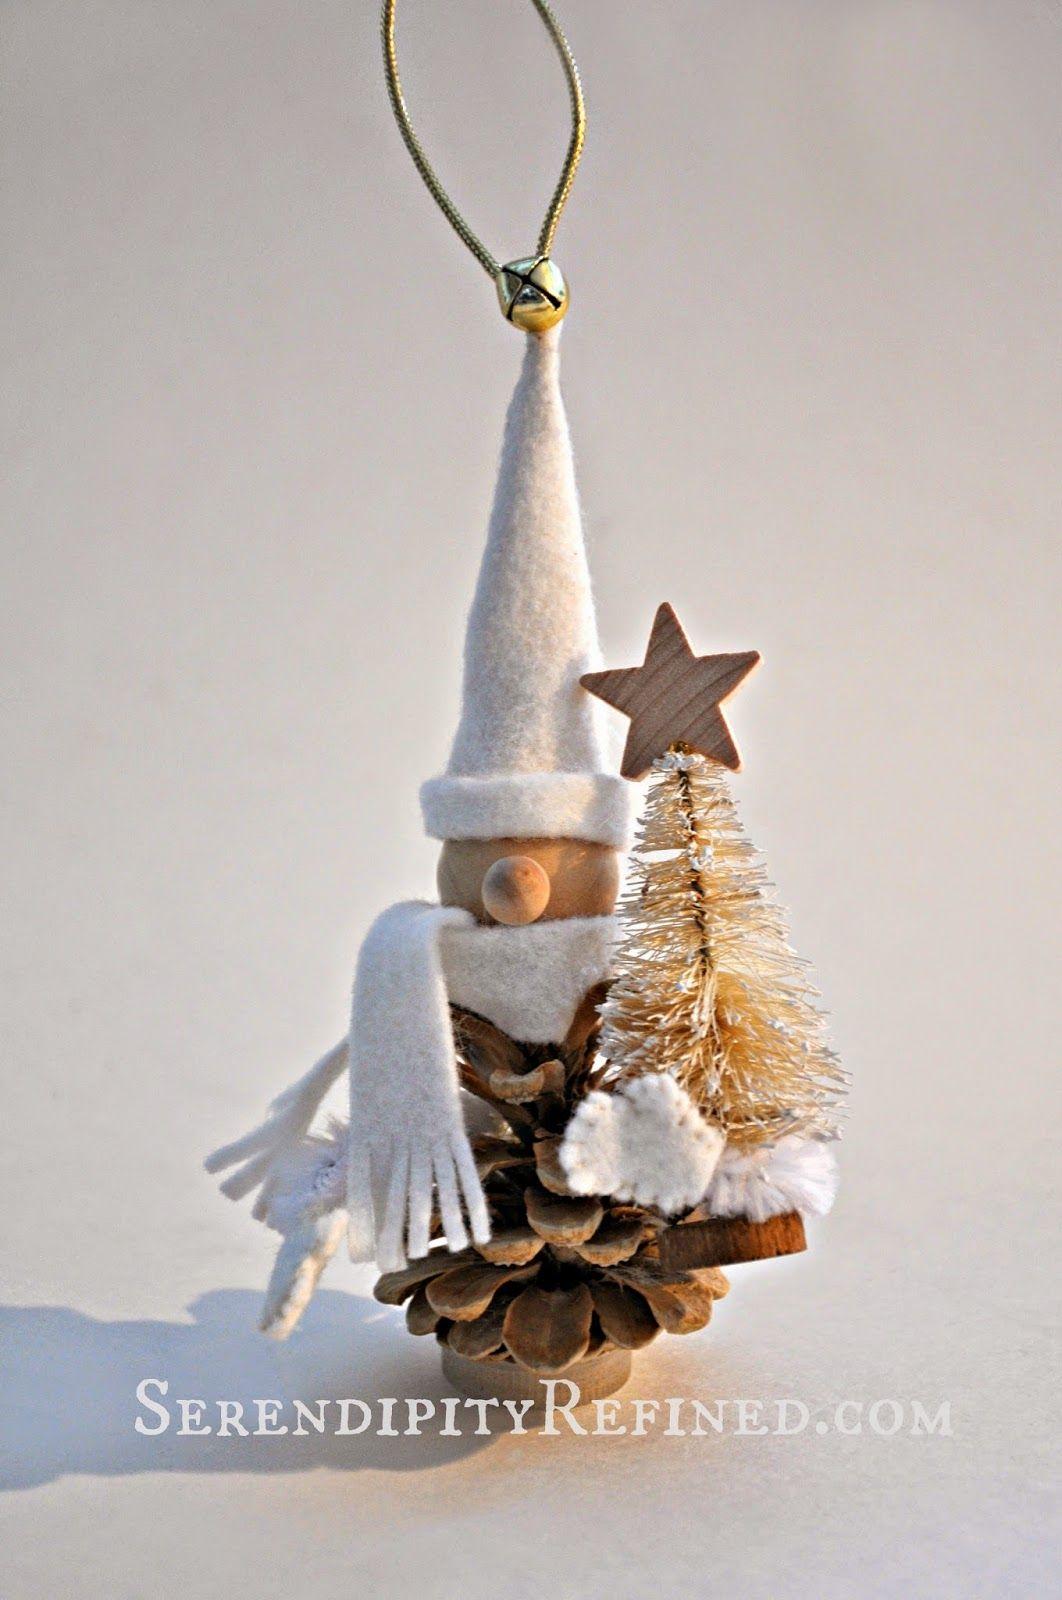 Serendipity Refined Blog Bleached Pinecone Woodland Gnome Handmade Christmas Tree Christmas Diy Christmas Decorations